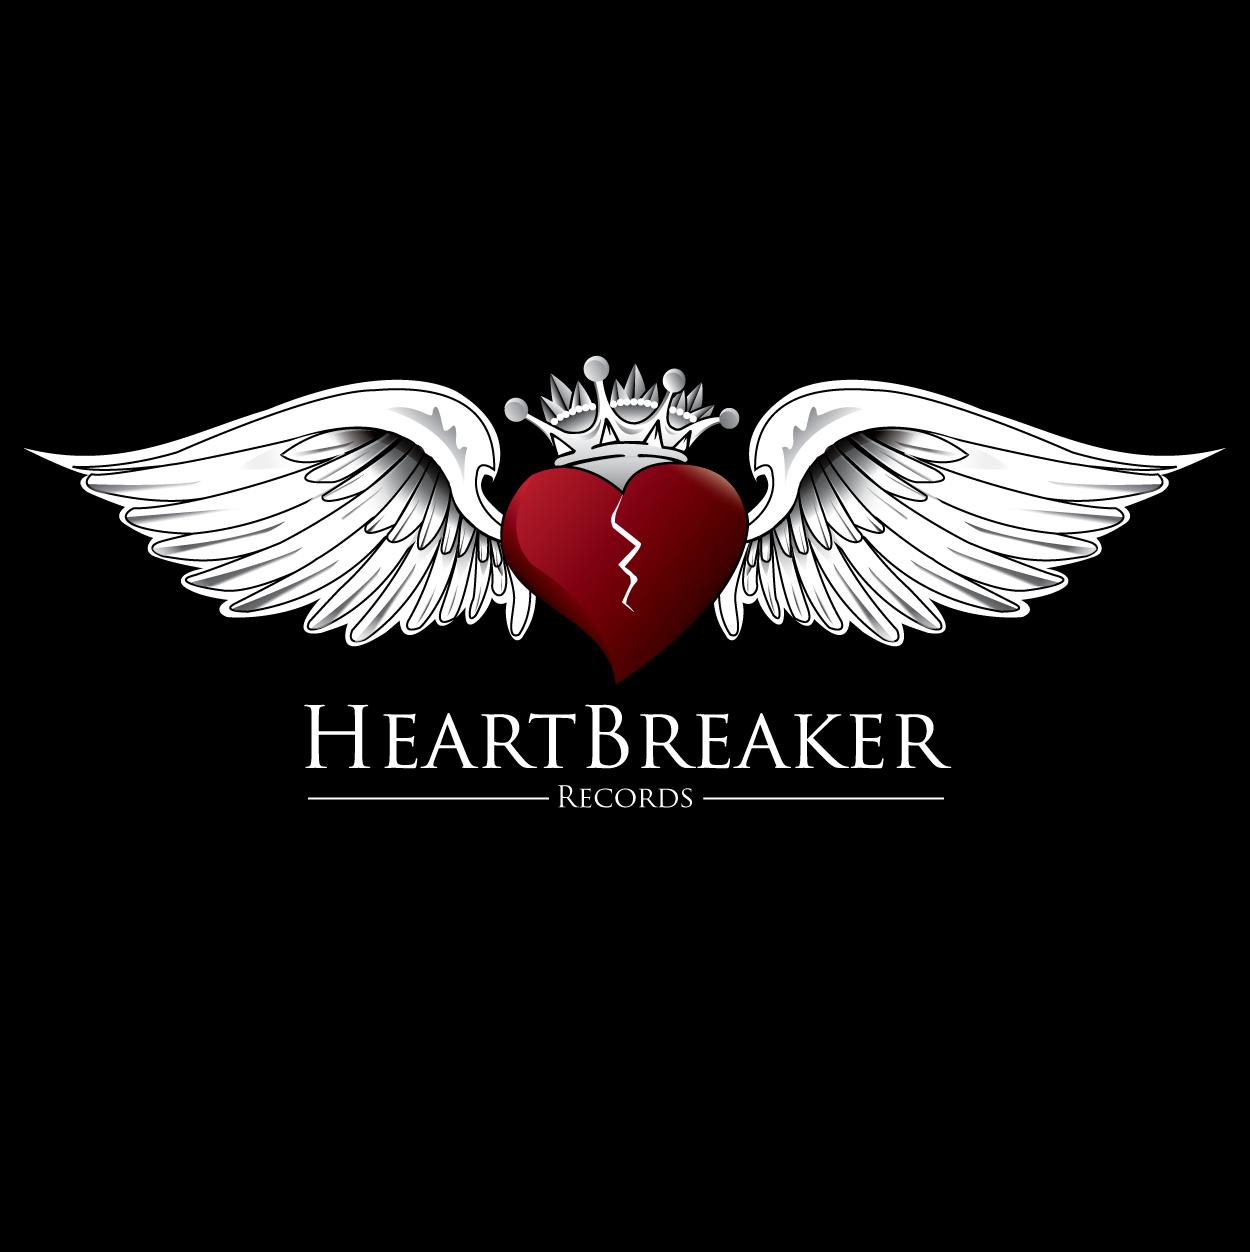 Logo Design by trabas - Entry No. 70 in the Logo Design Contest Heartbreaker Records.